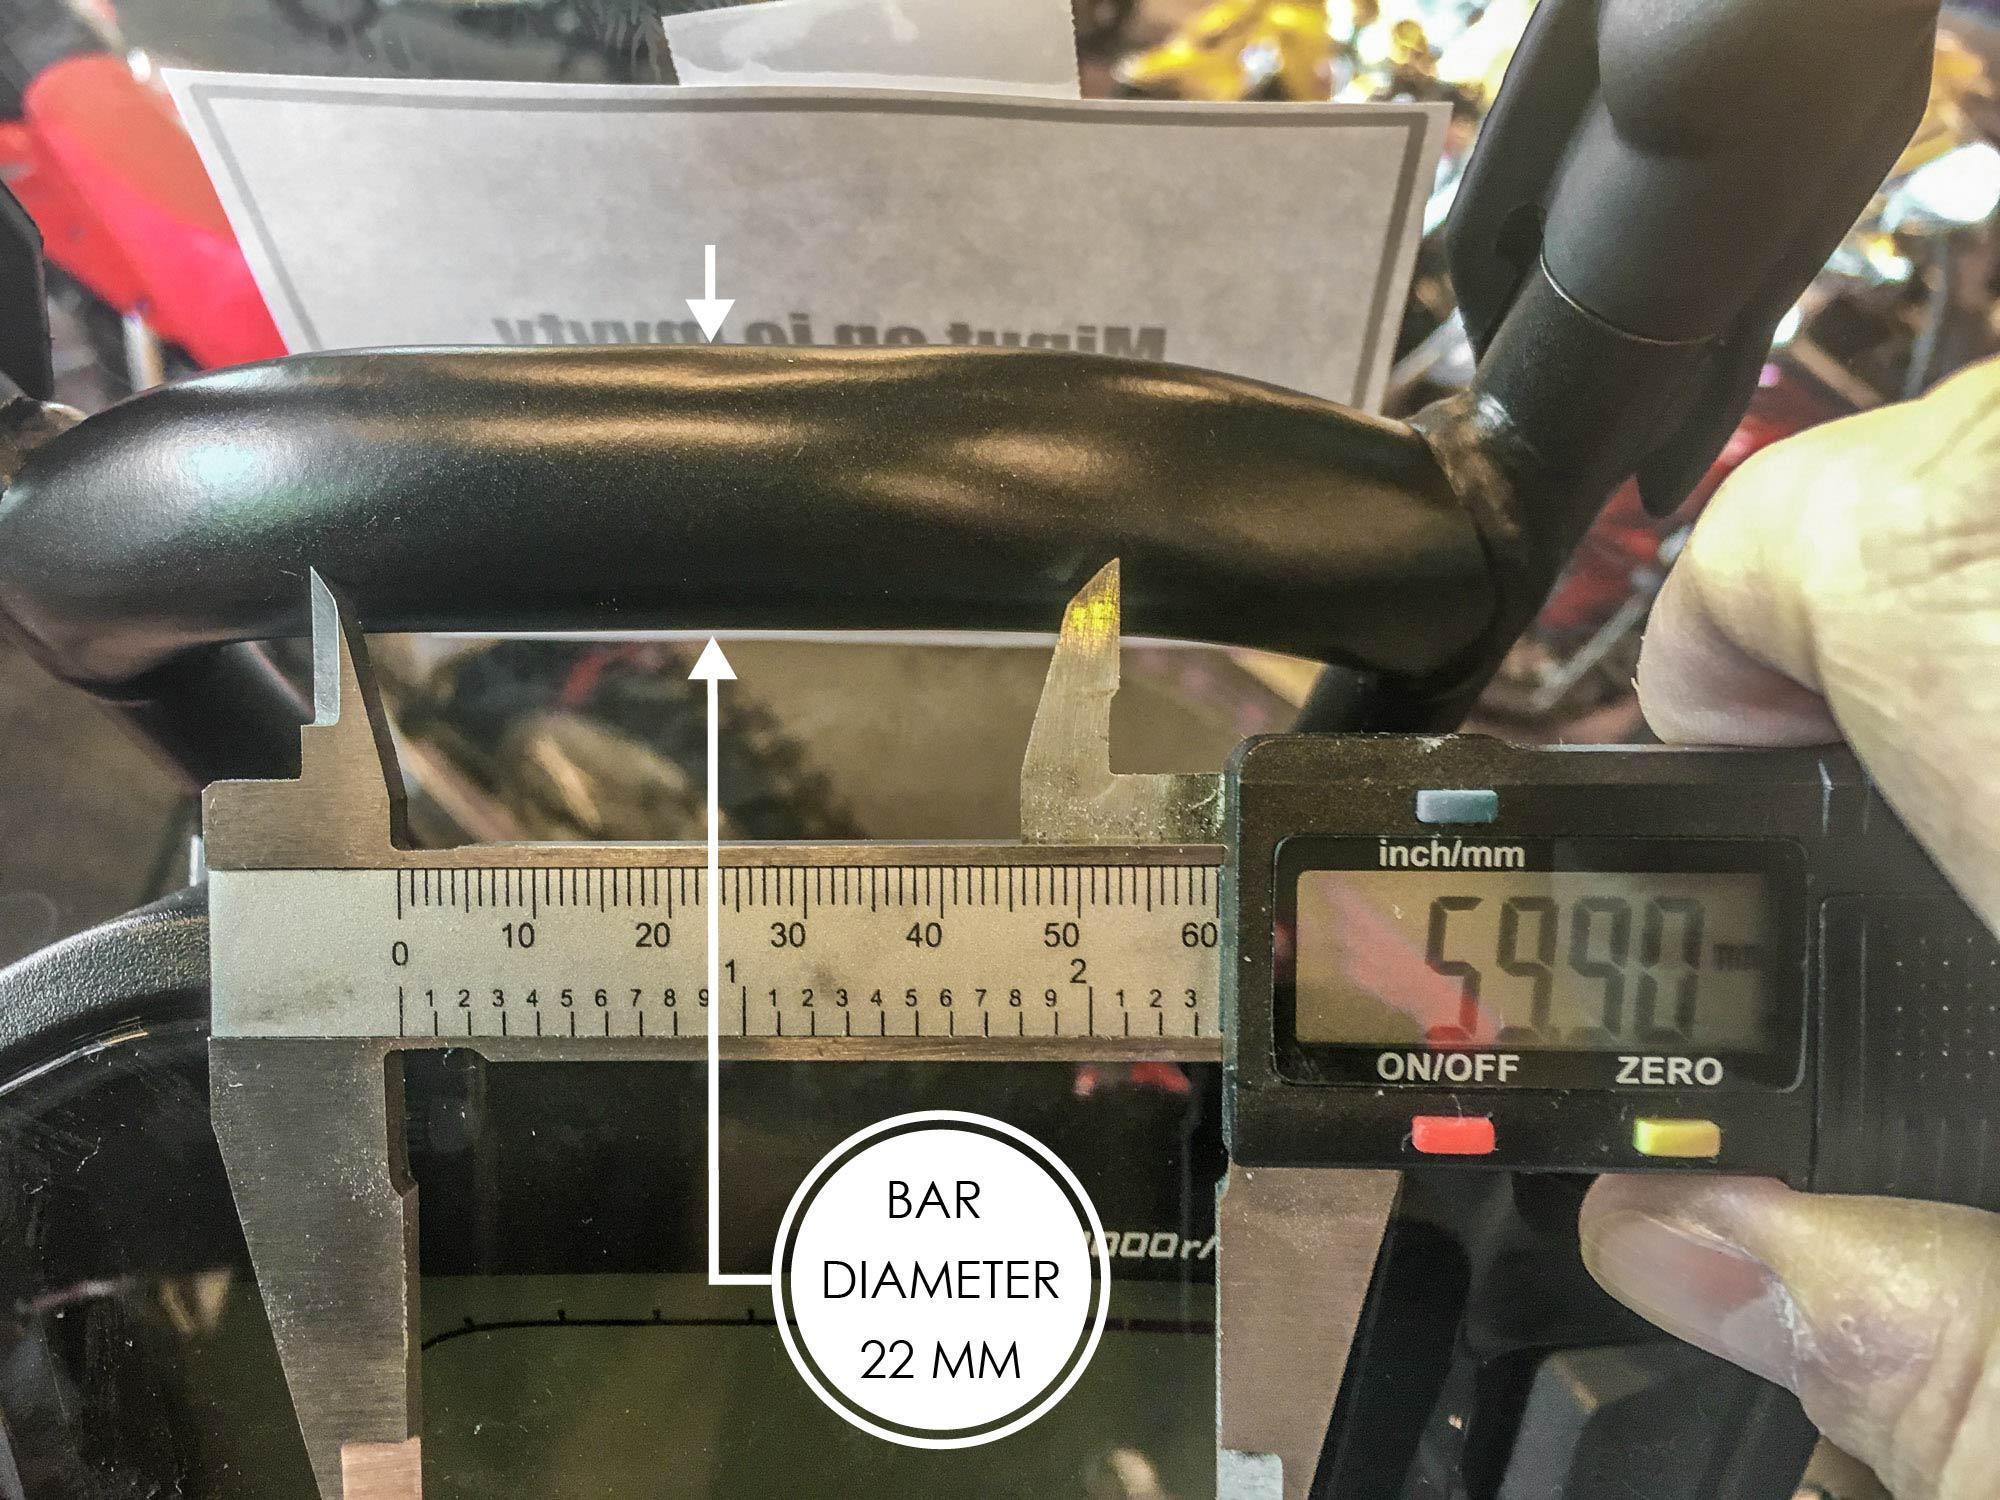 Honda CRF 250 Rally GPS / accessory bar